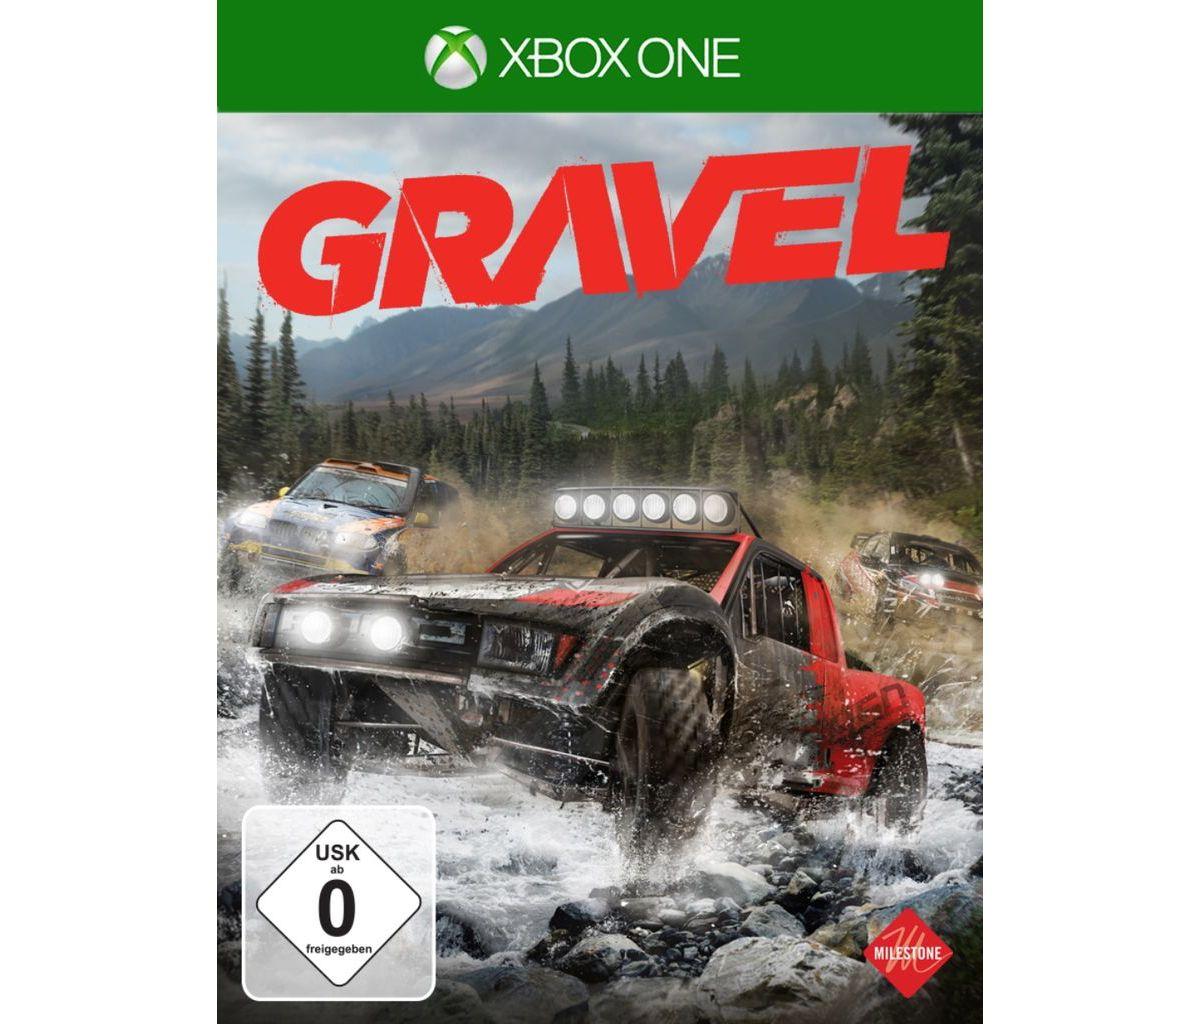 Milestone XBOX One - Spiel »Gravel«